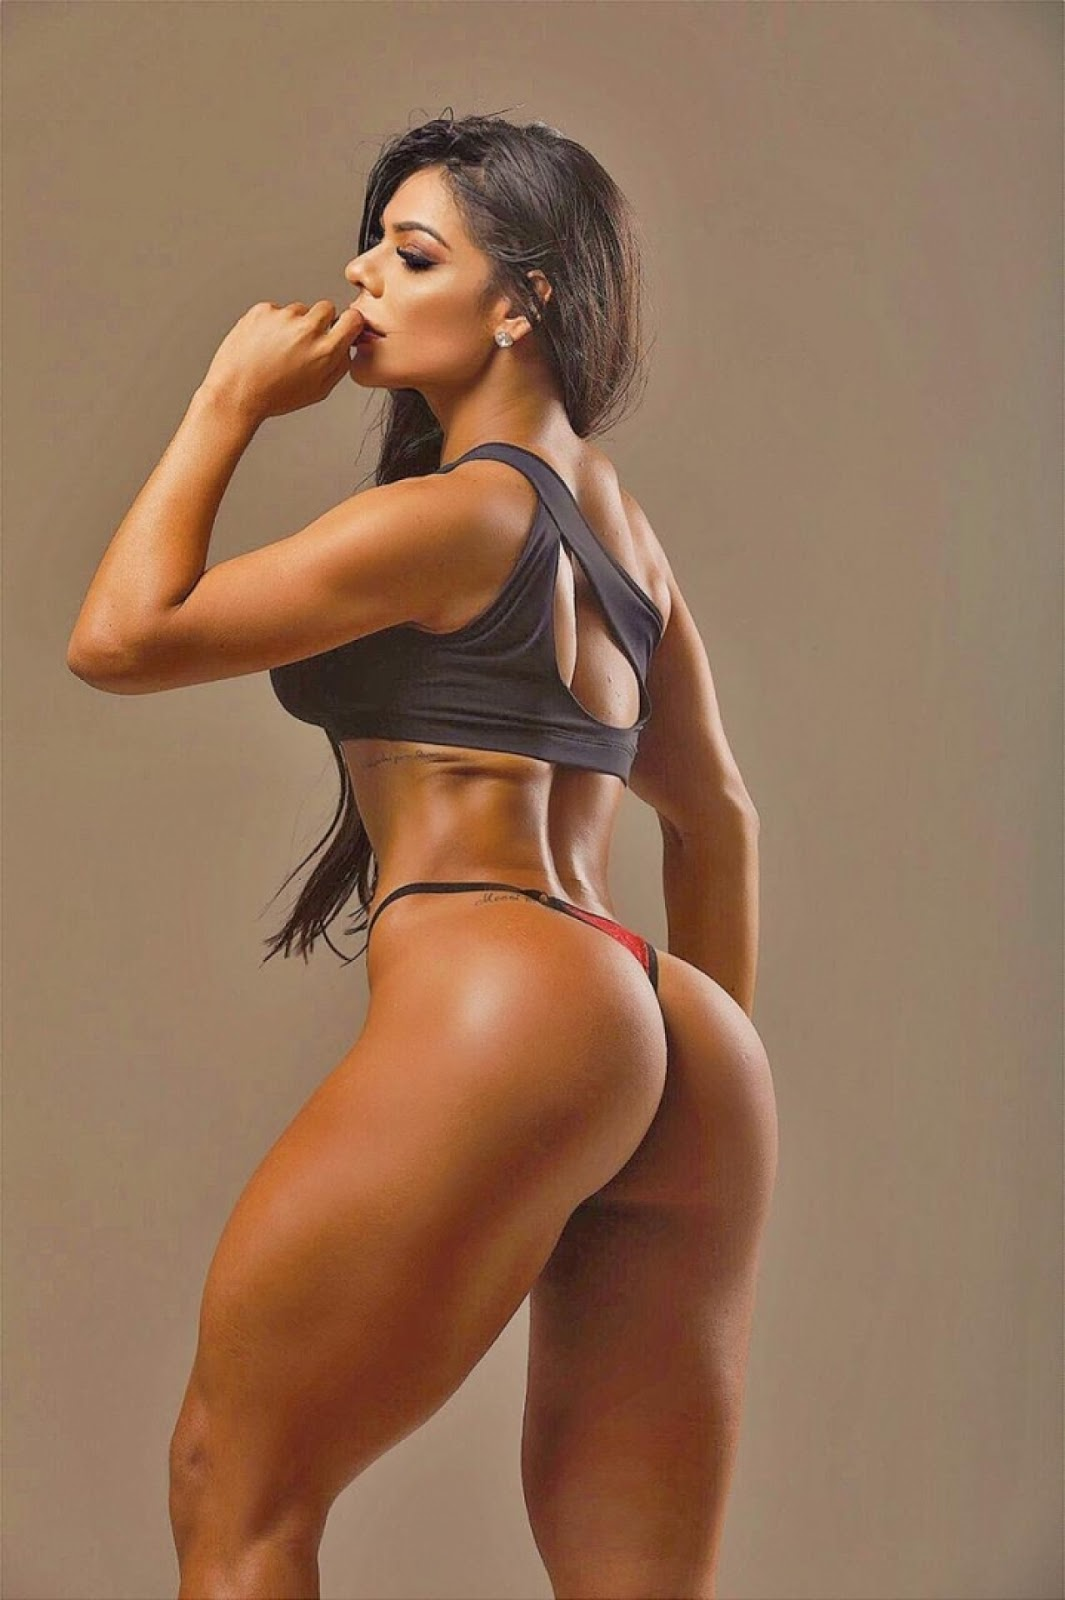 Suzy Cortez treina forte e faz dieta rigorosa